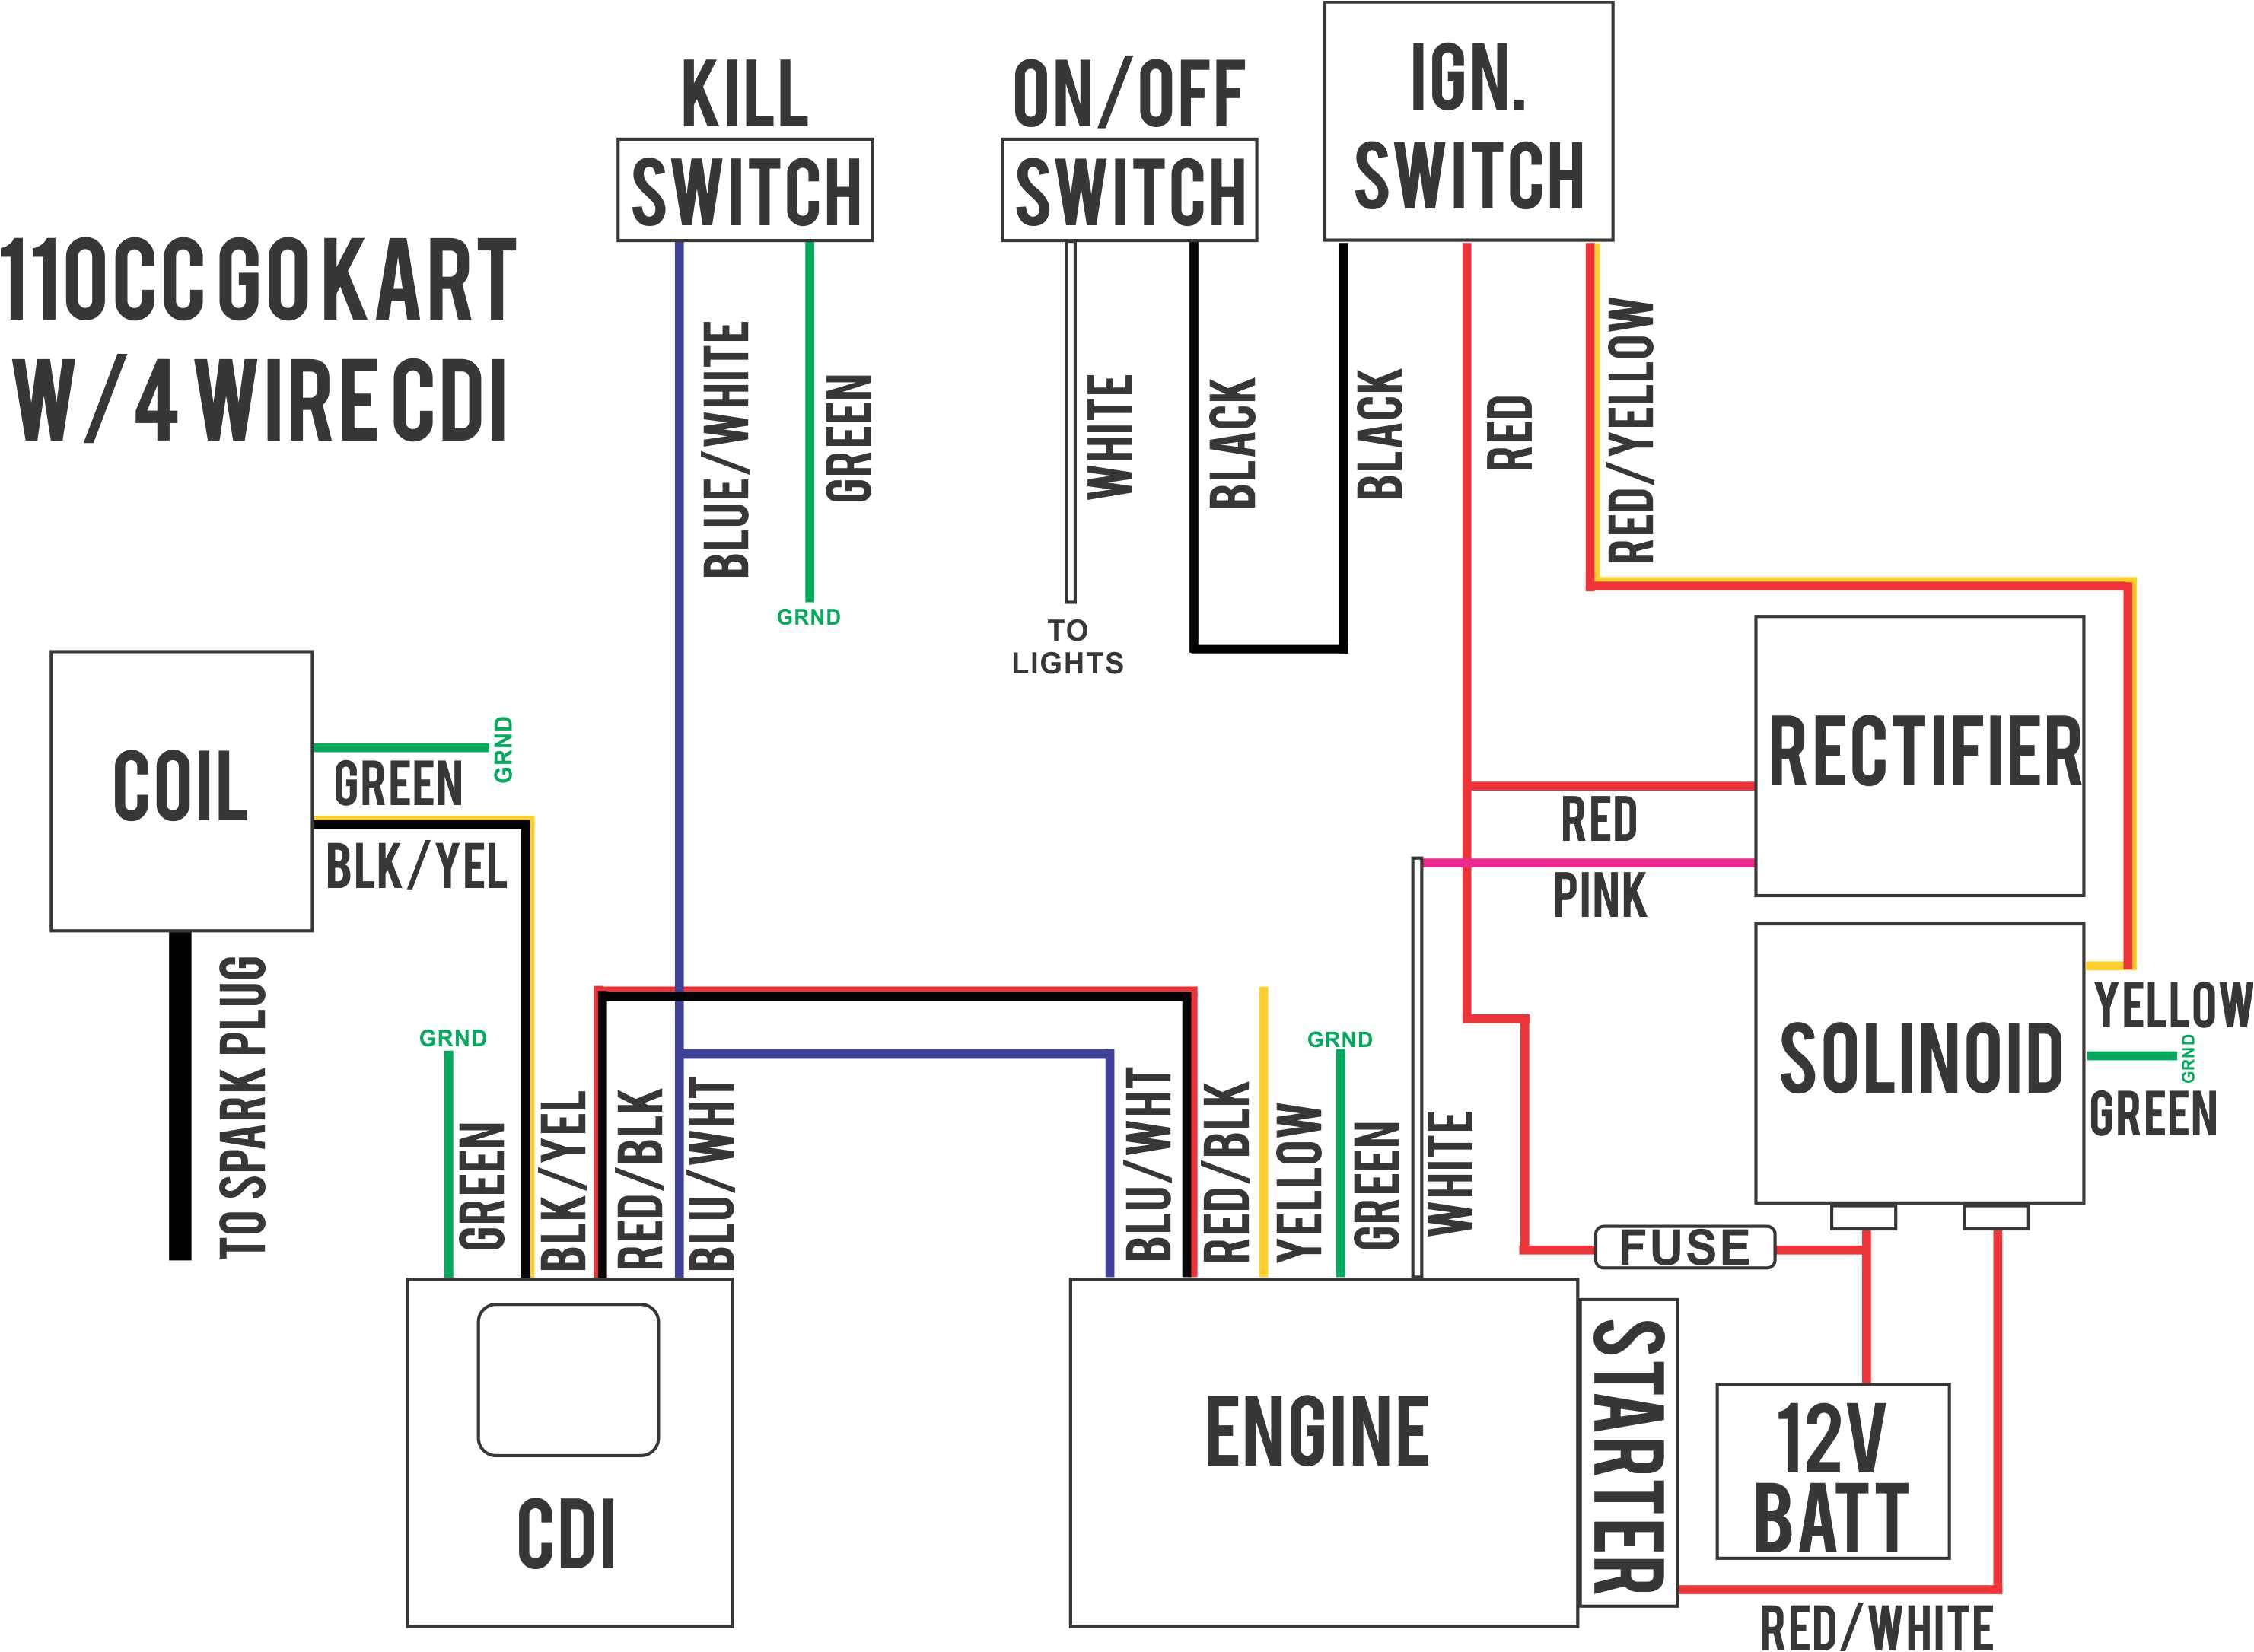 Chinese Cdi Wiring Diagram Roketa atv Cdi Wiring Diagrams Wiring Diagram Completed